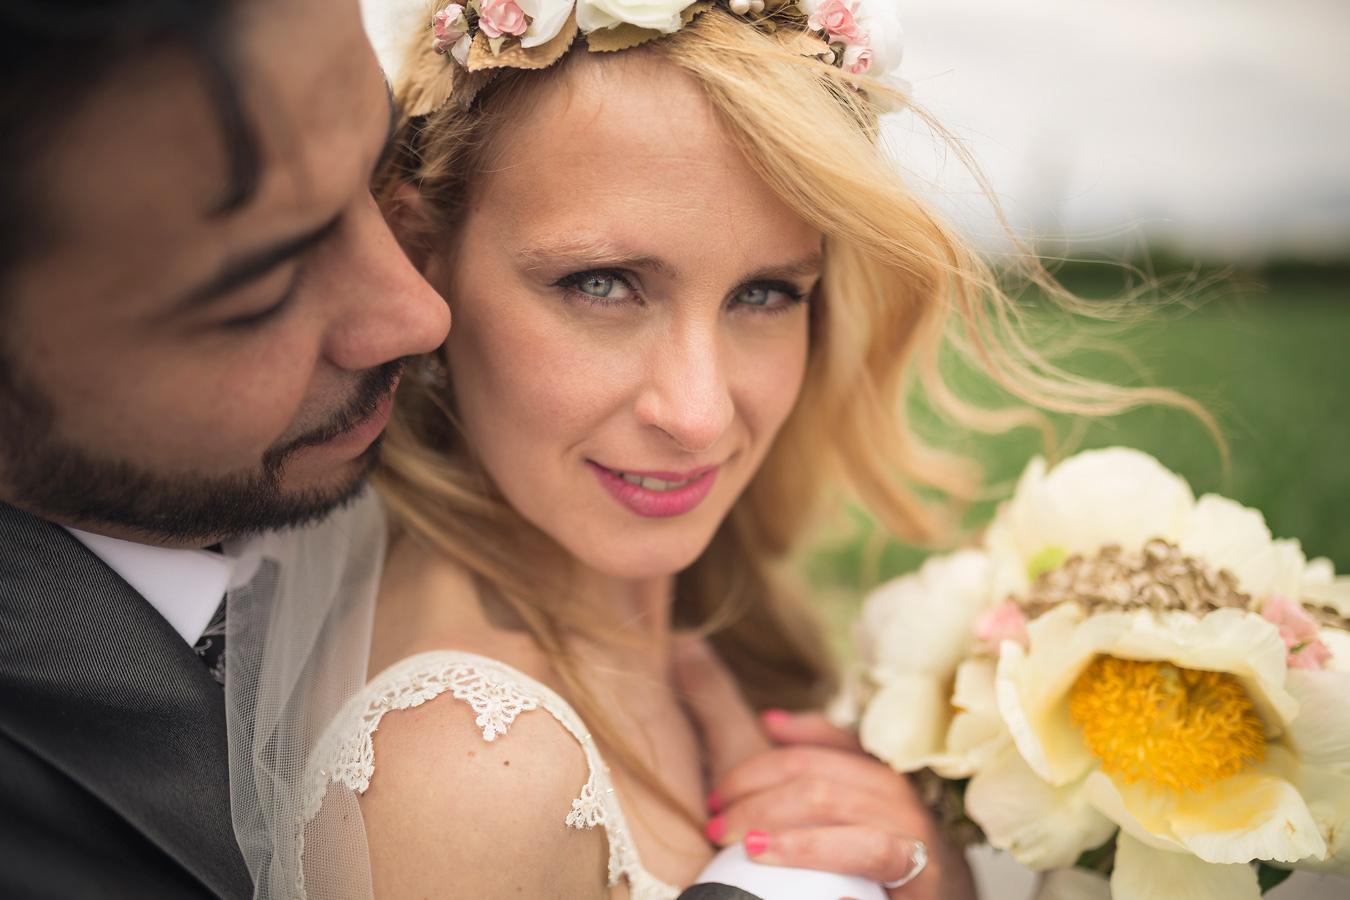 fotografo de boda granada caballoblanco malaga archidona